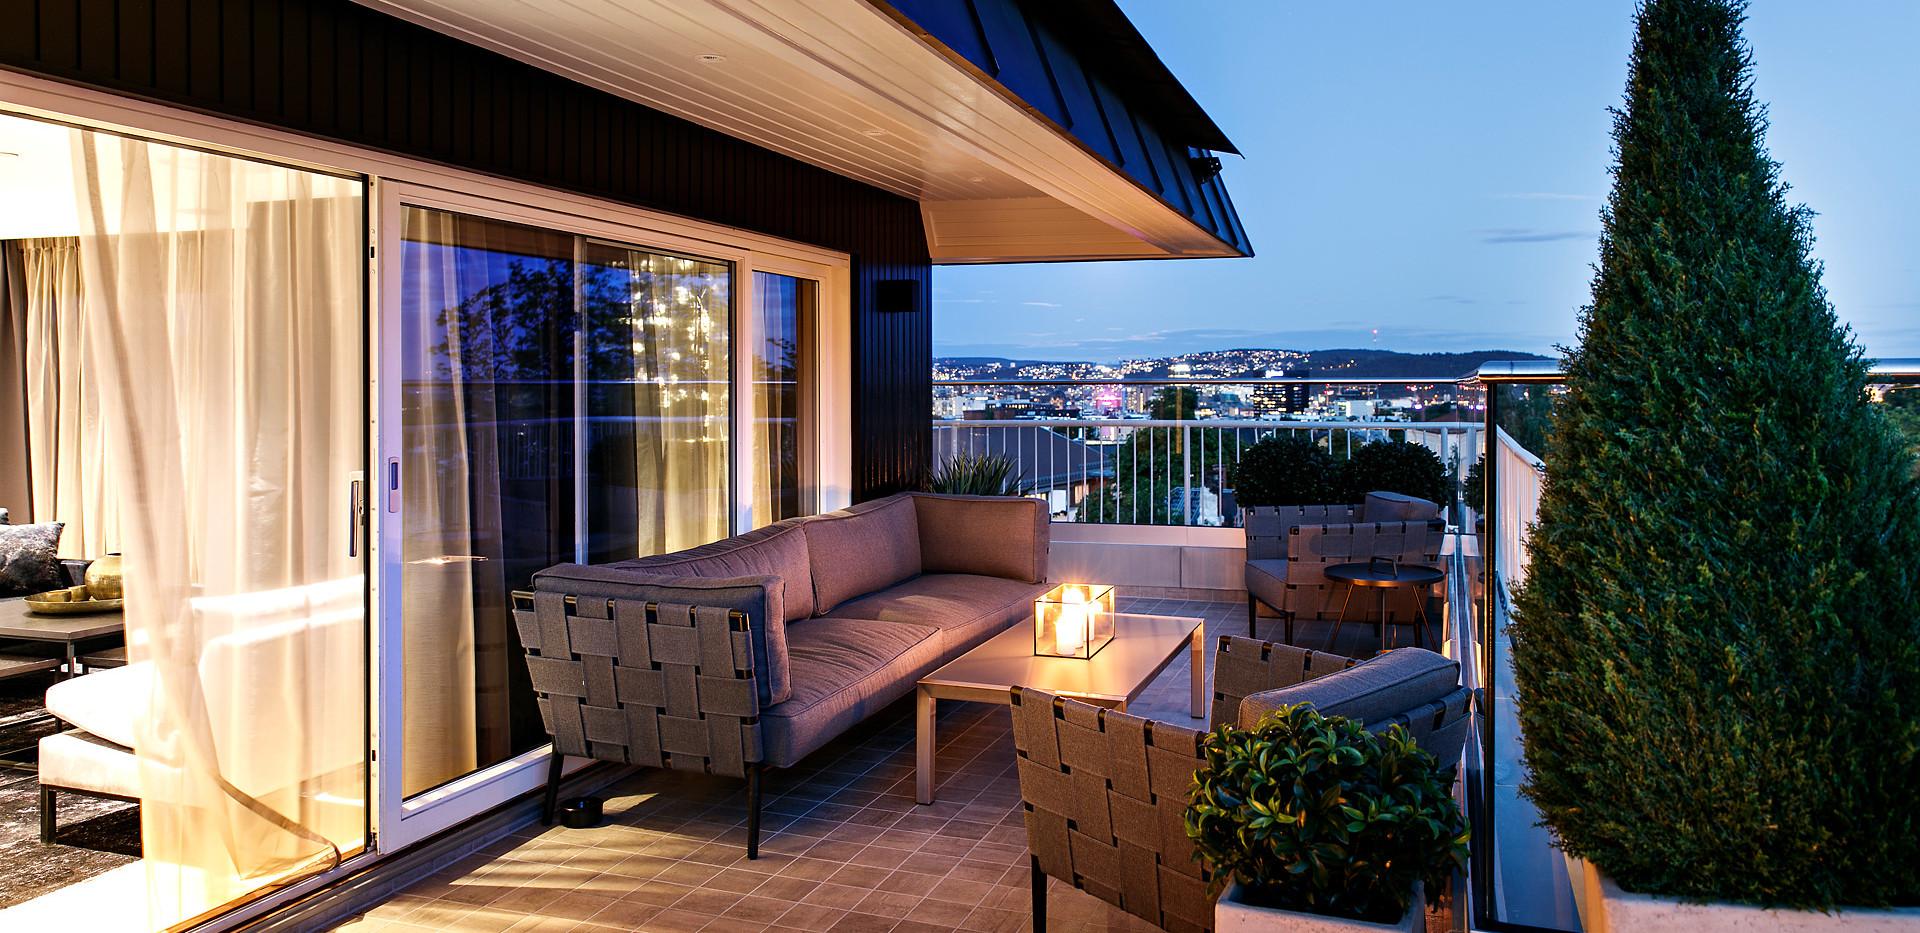 saga-hotel-oslo-10.jpg